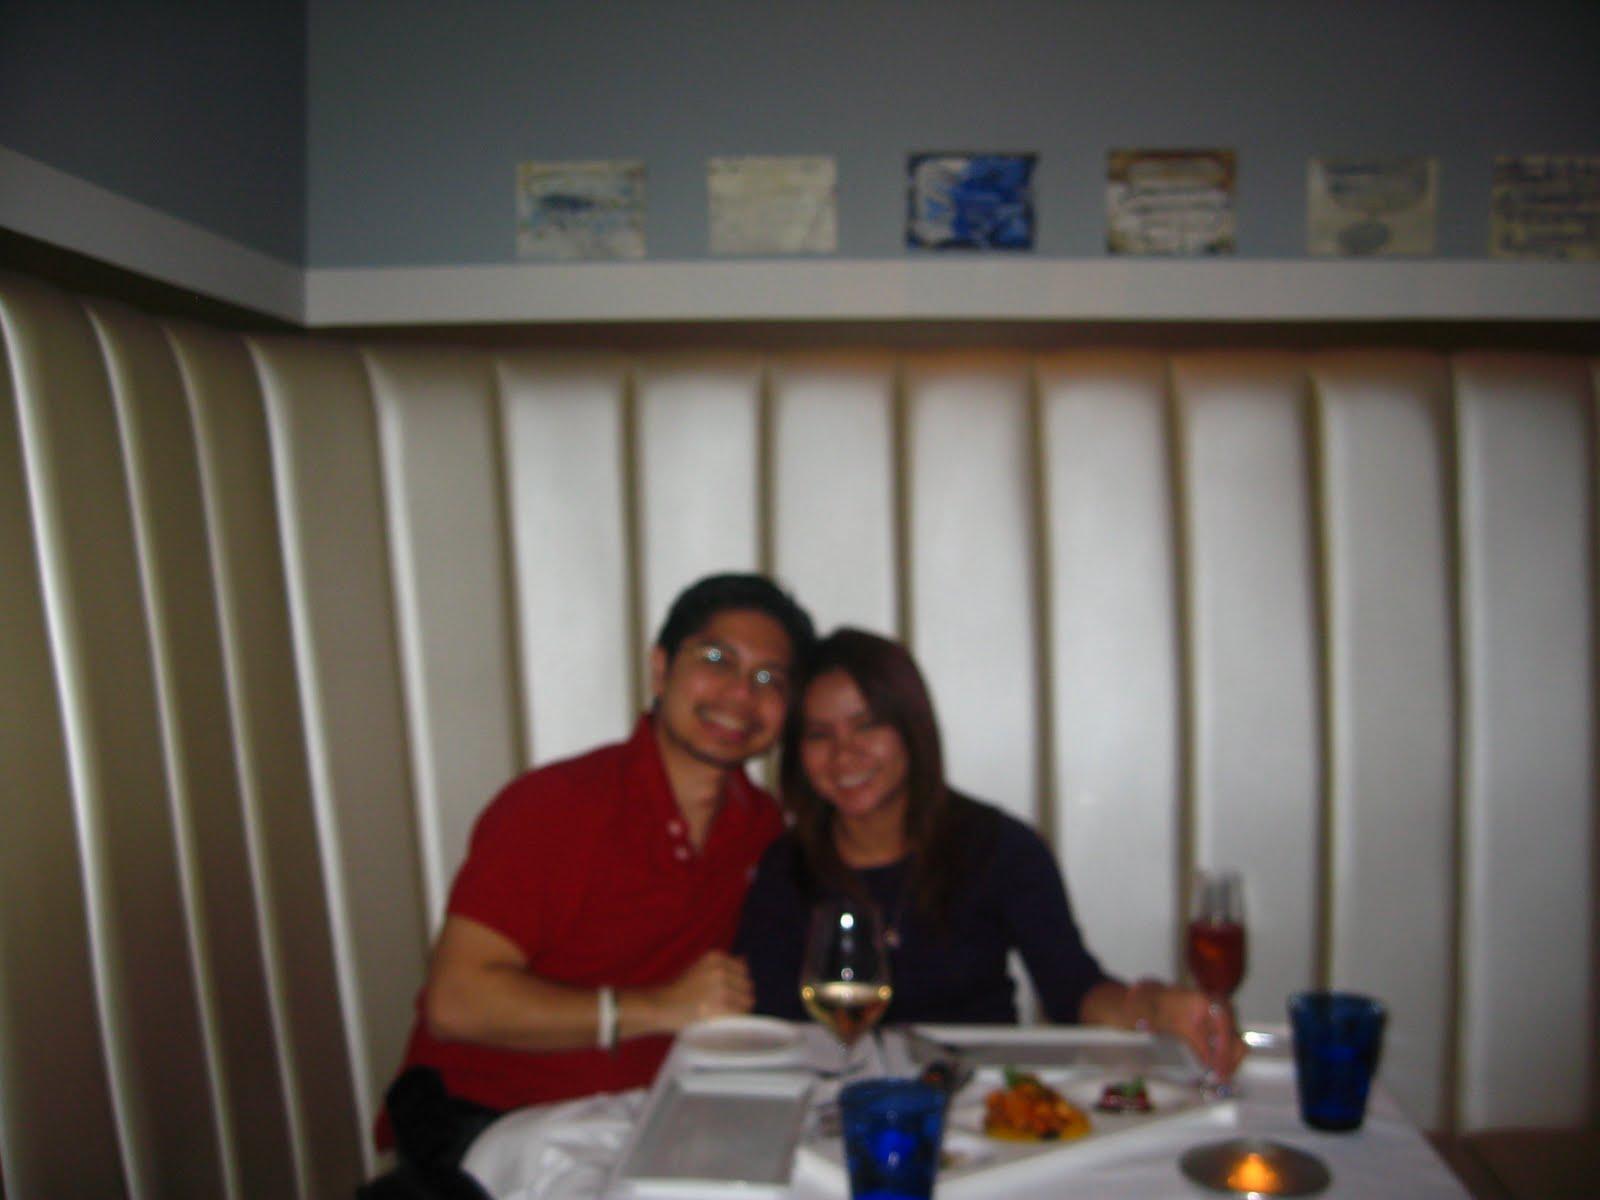 italian restaurant in calgary  ab at  4 1420 9 avenue se  403 264 2276